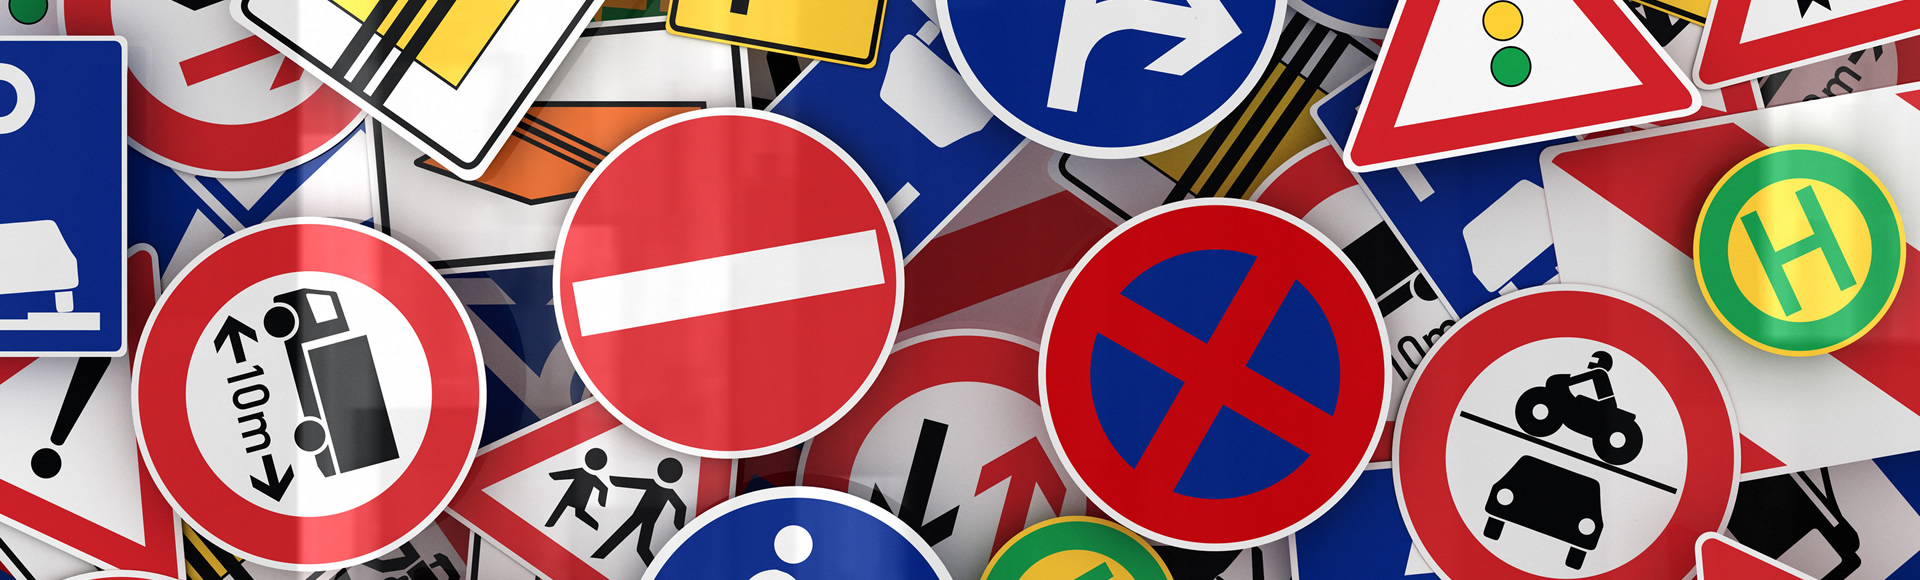 Fotografia cartelli stradali